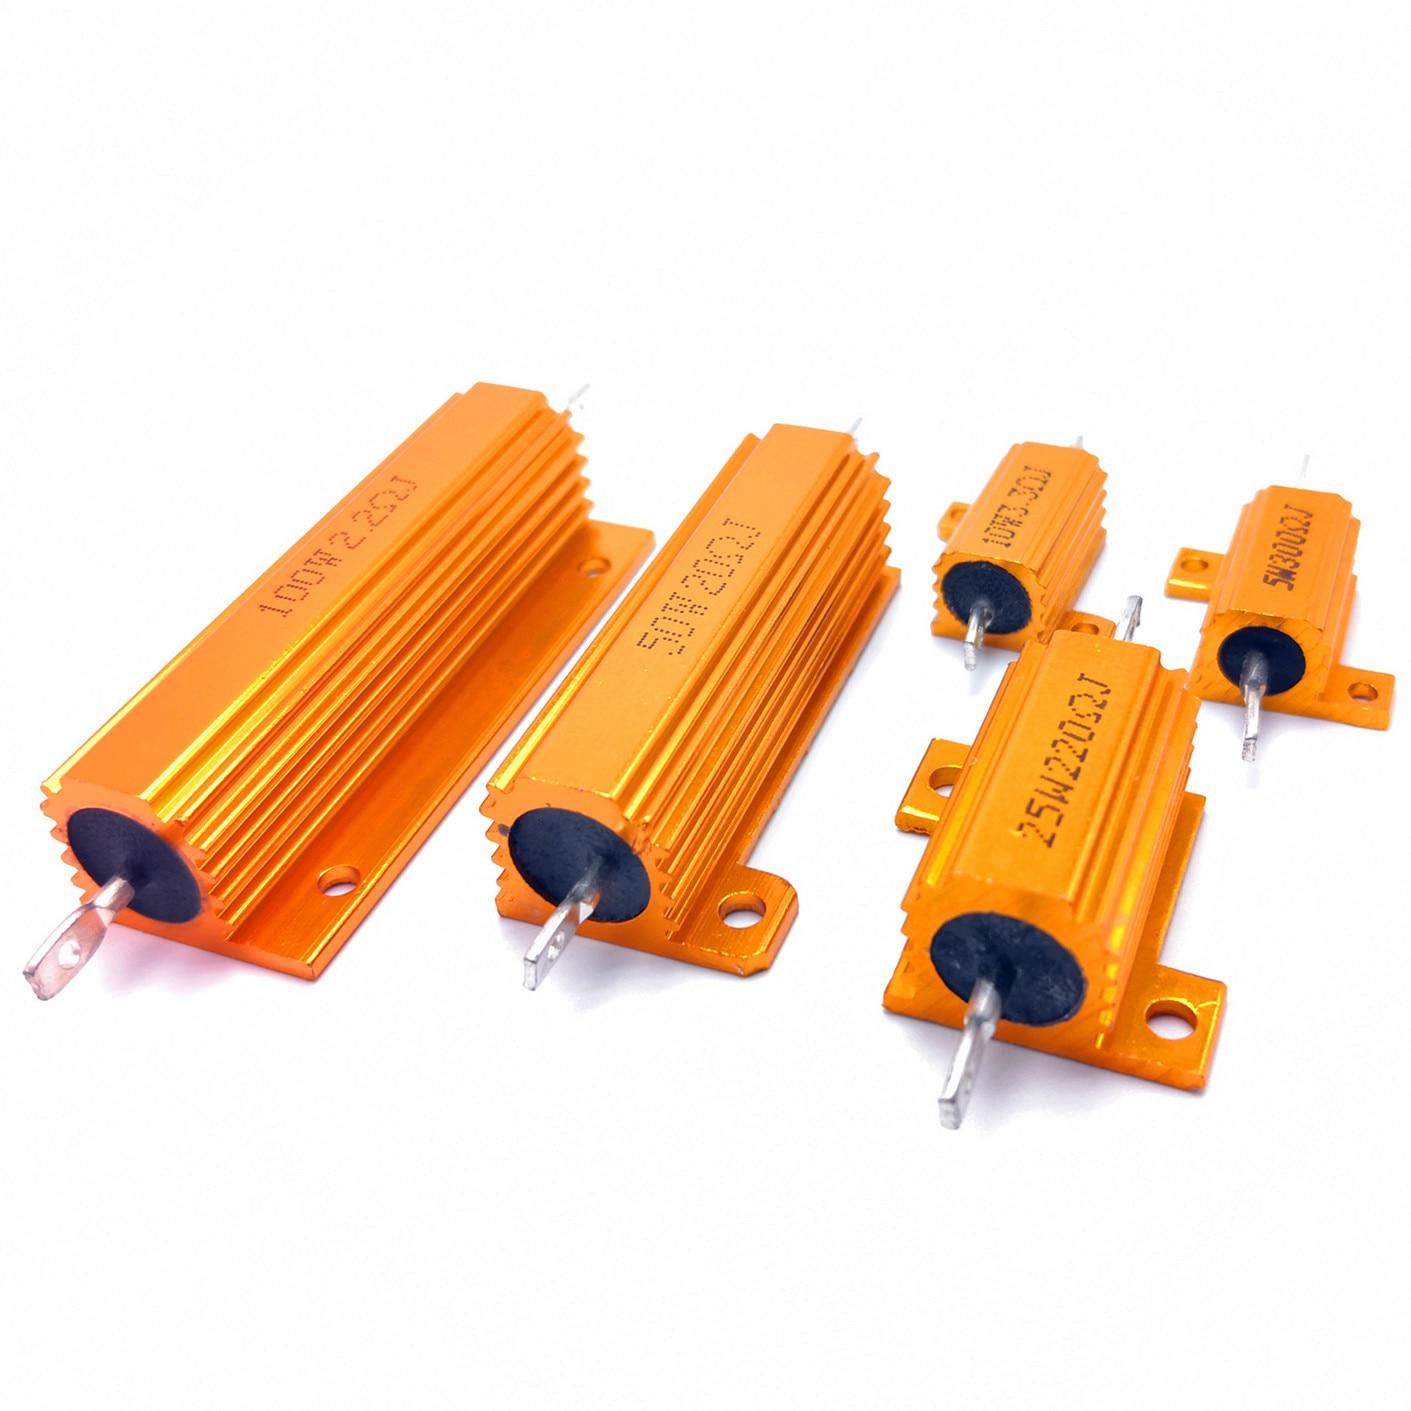 100W High Power 15 Ohm 15R Golden Aluminum Shell Case Wirewound Resistor 5/%